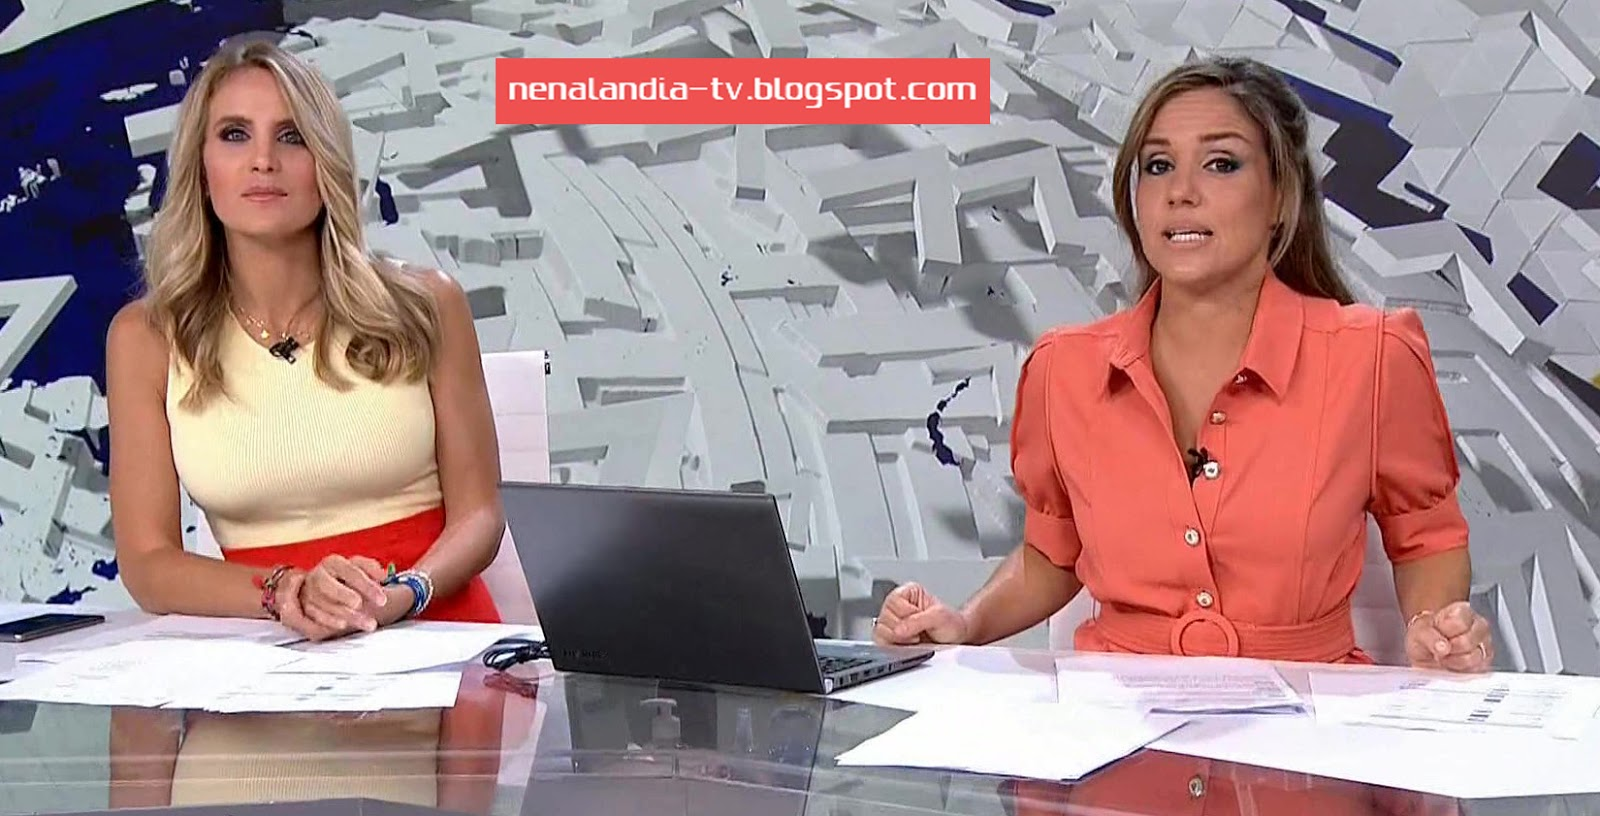 Angie+Rigueiro+Marina+Monzon+NENALANDIA-